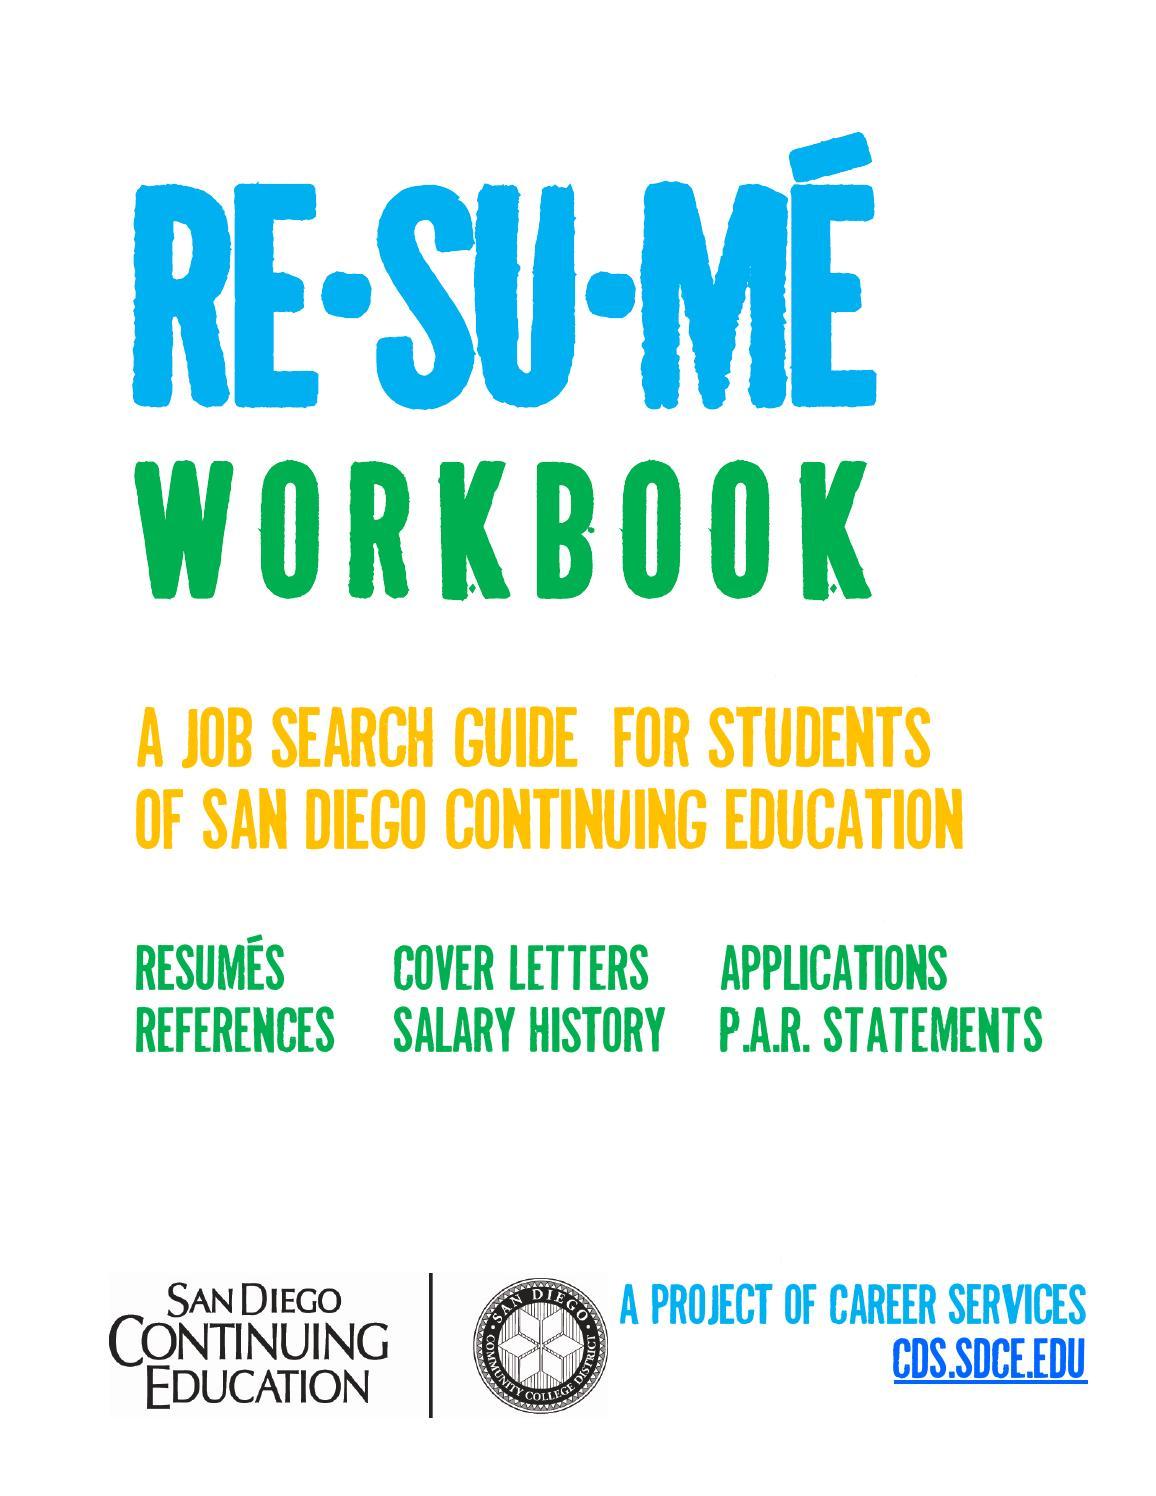 resume workbook by doug elliot